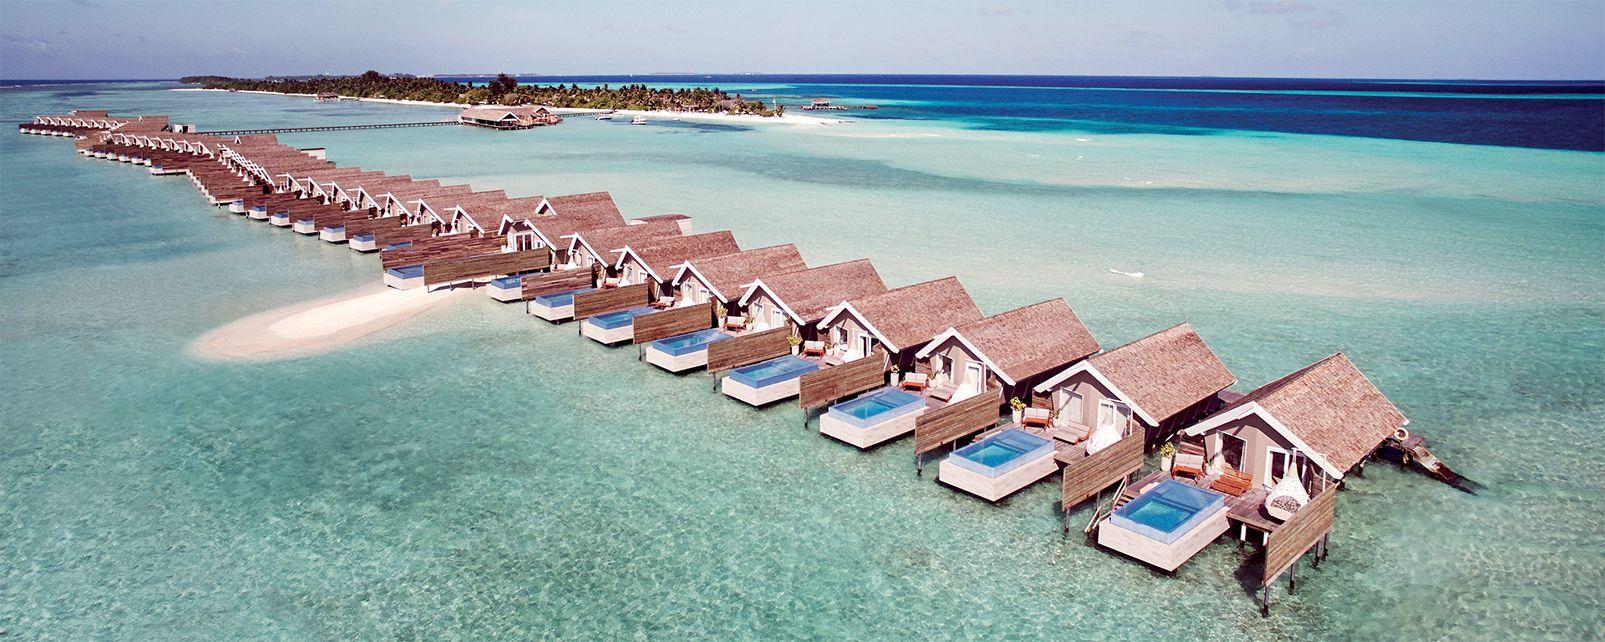 Hôtel LUX* South Ari Atoll